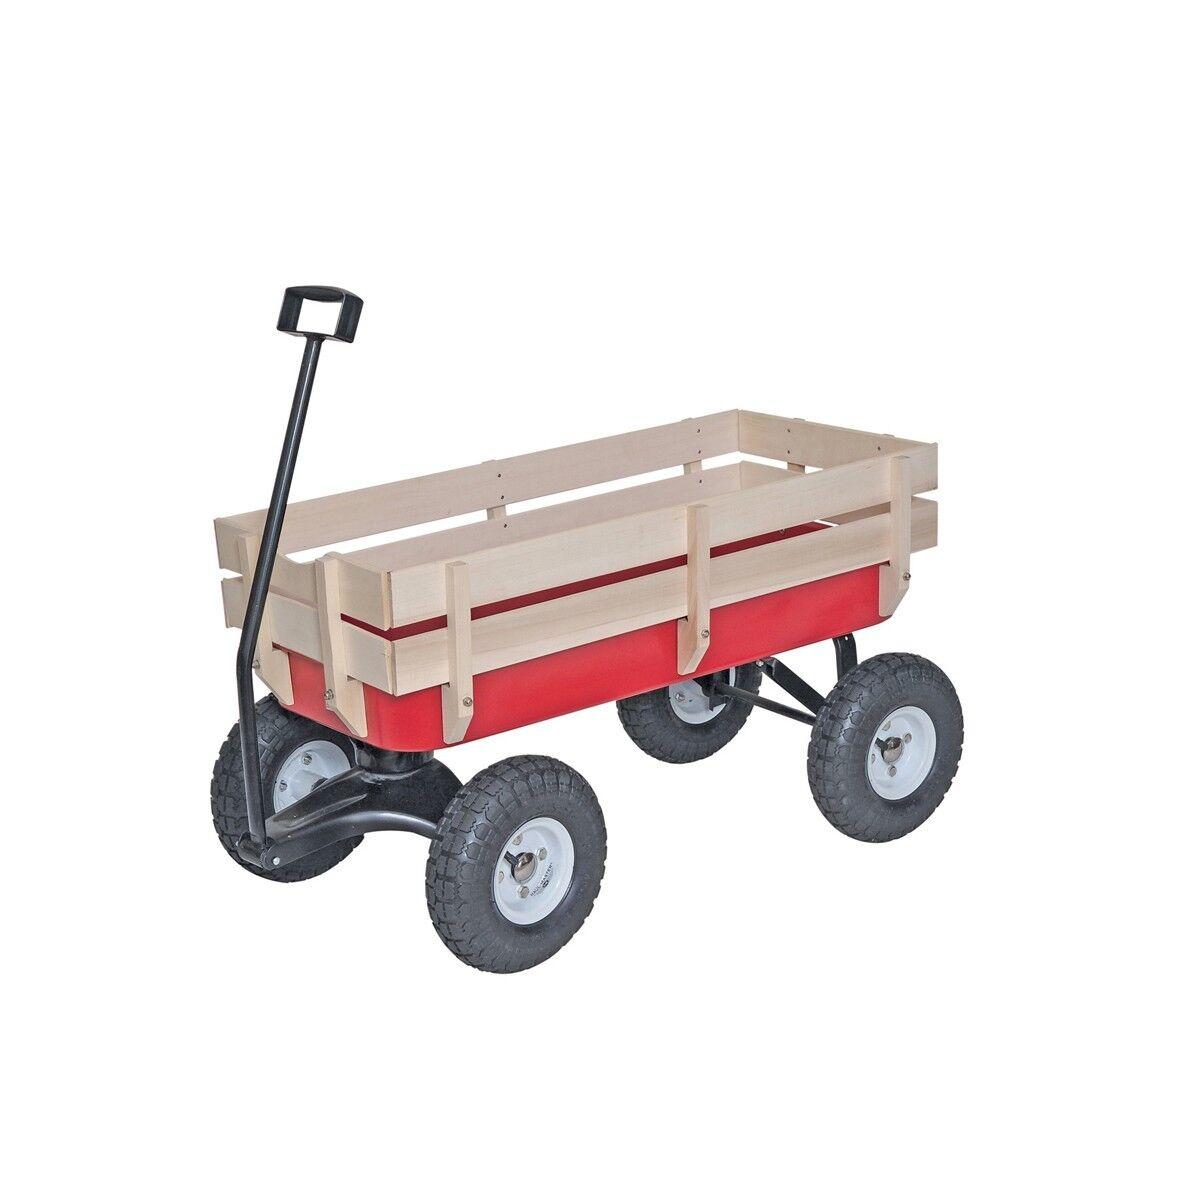 BIGFOOT BIG FOOT PANEL PANEL PANEL WAGON - Wooden Sides BIG 10  Tires  KIDS or LAWNCARE NEW 02c8b2